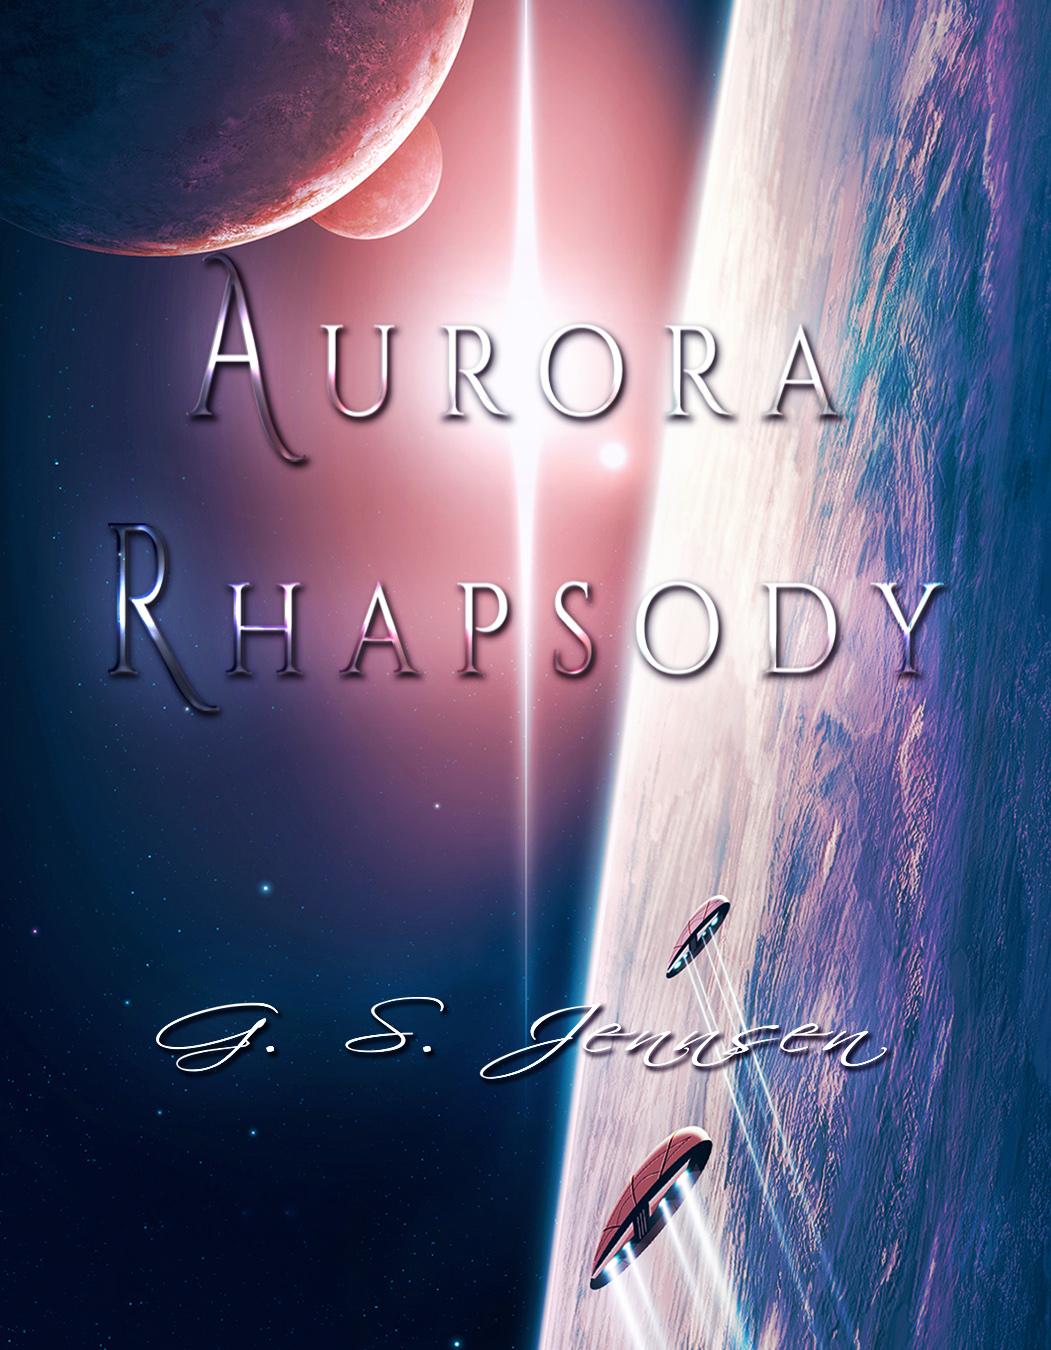 AURORA RHAPSODY WINE LABEL    Size: 4.5 inches x 3.5 inches